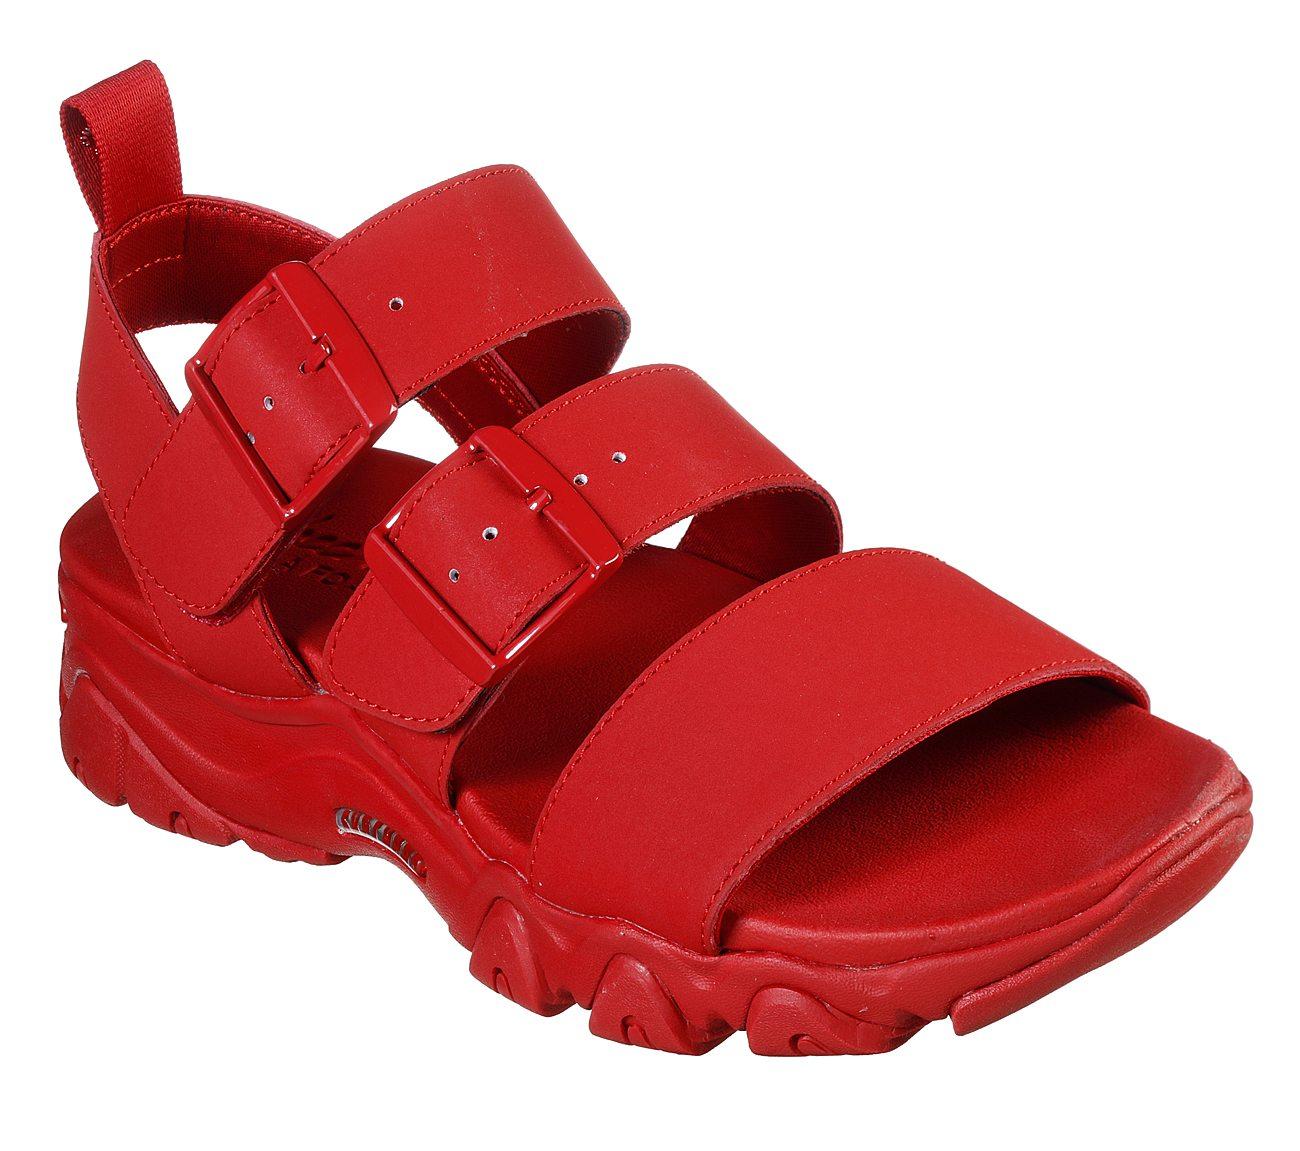 0af9c7f771ab Buy SKECHERS D Lites 2.0 - Cool Cosmos Cali Shoes only  58.00